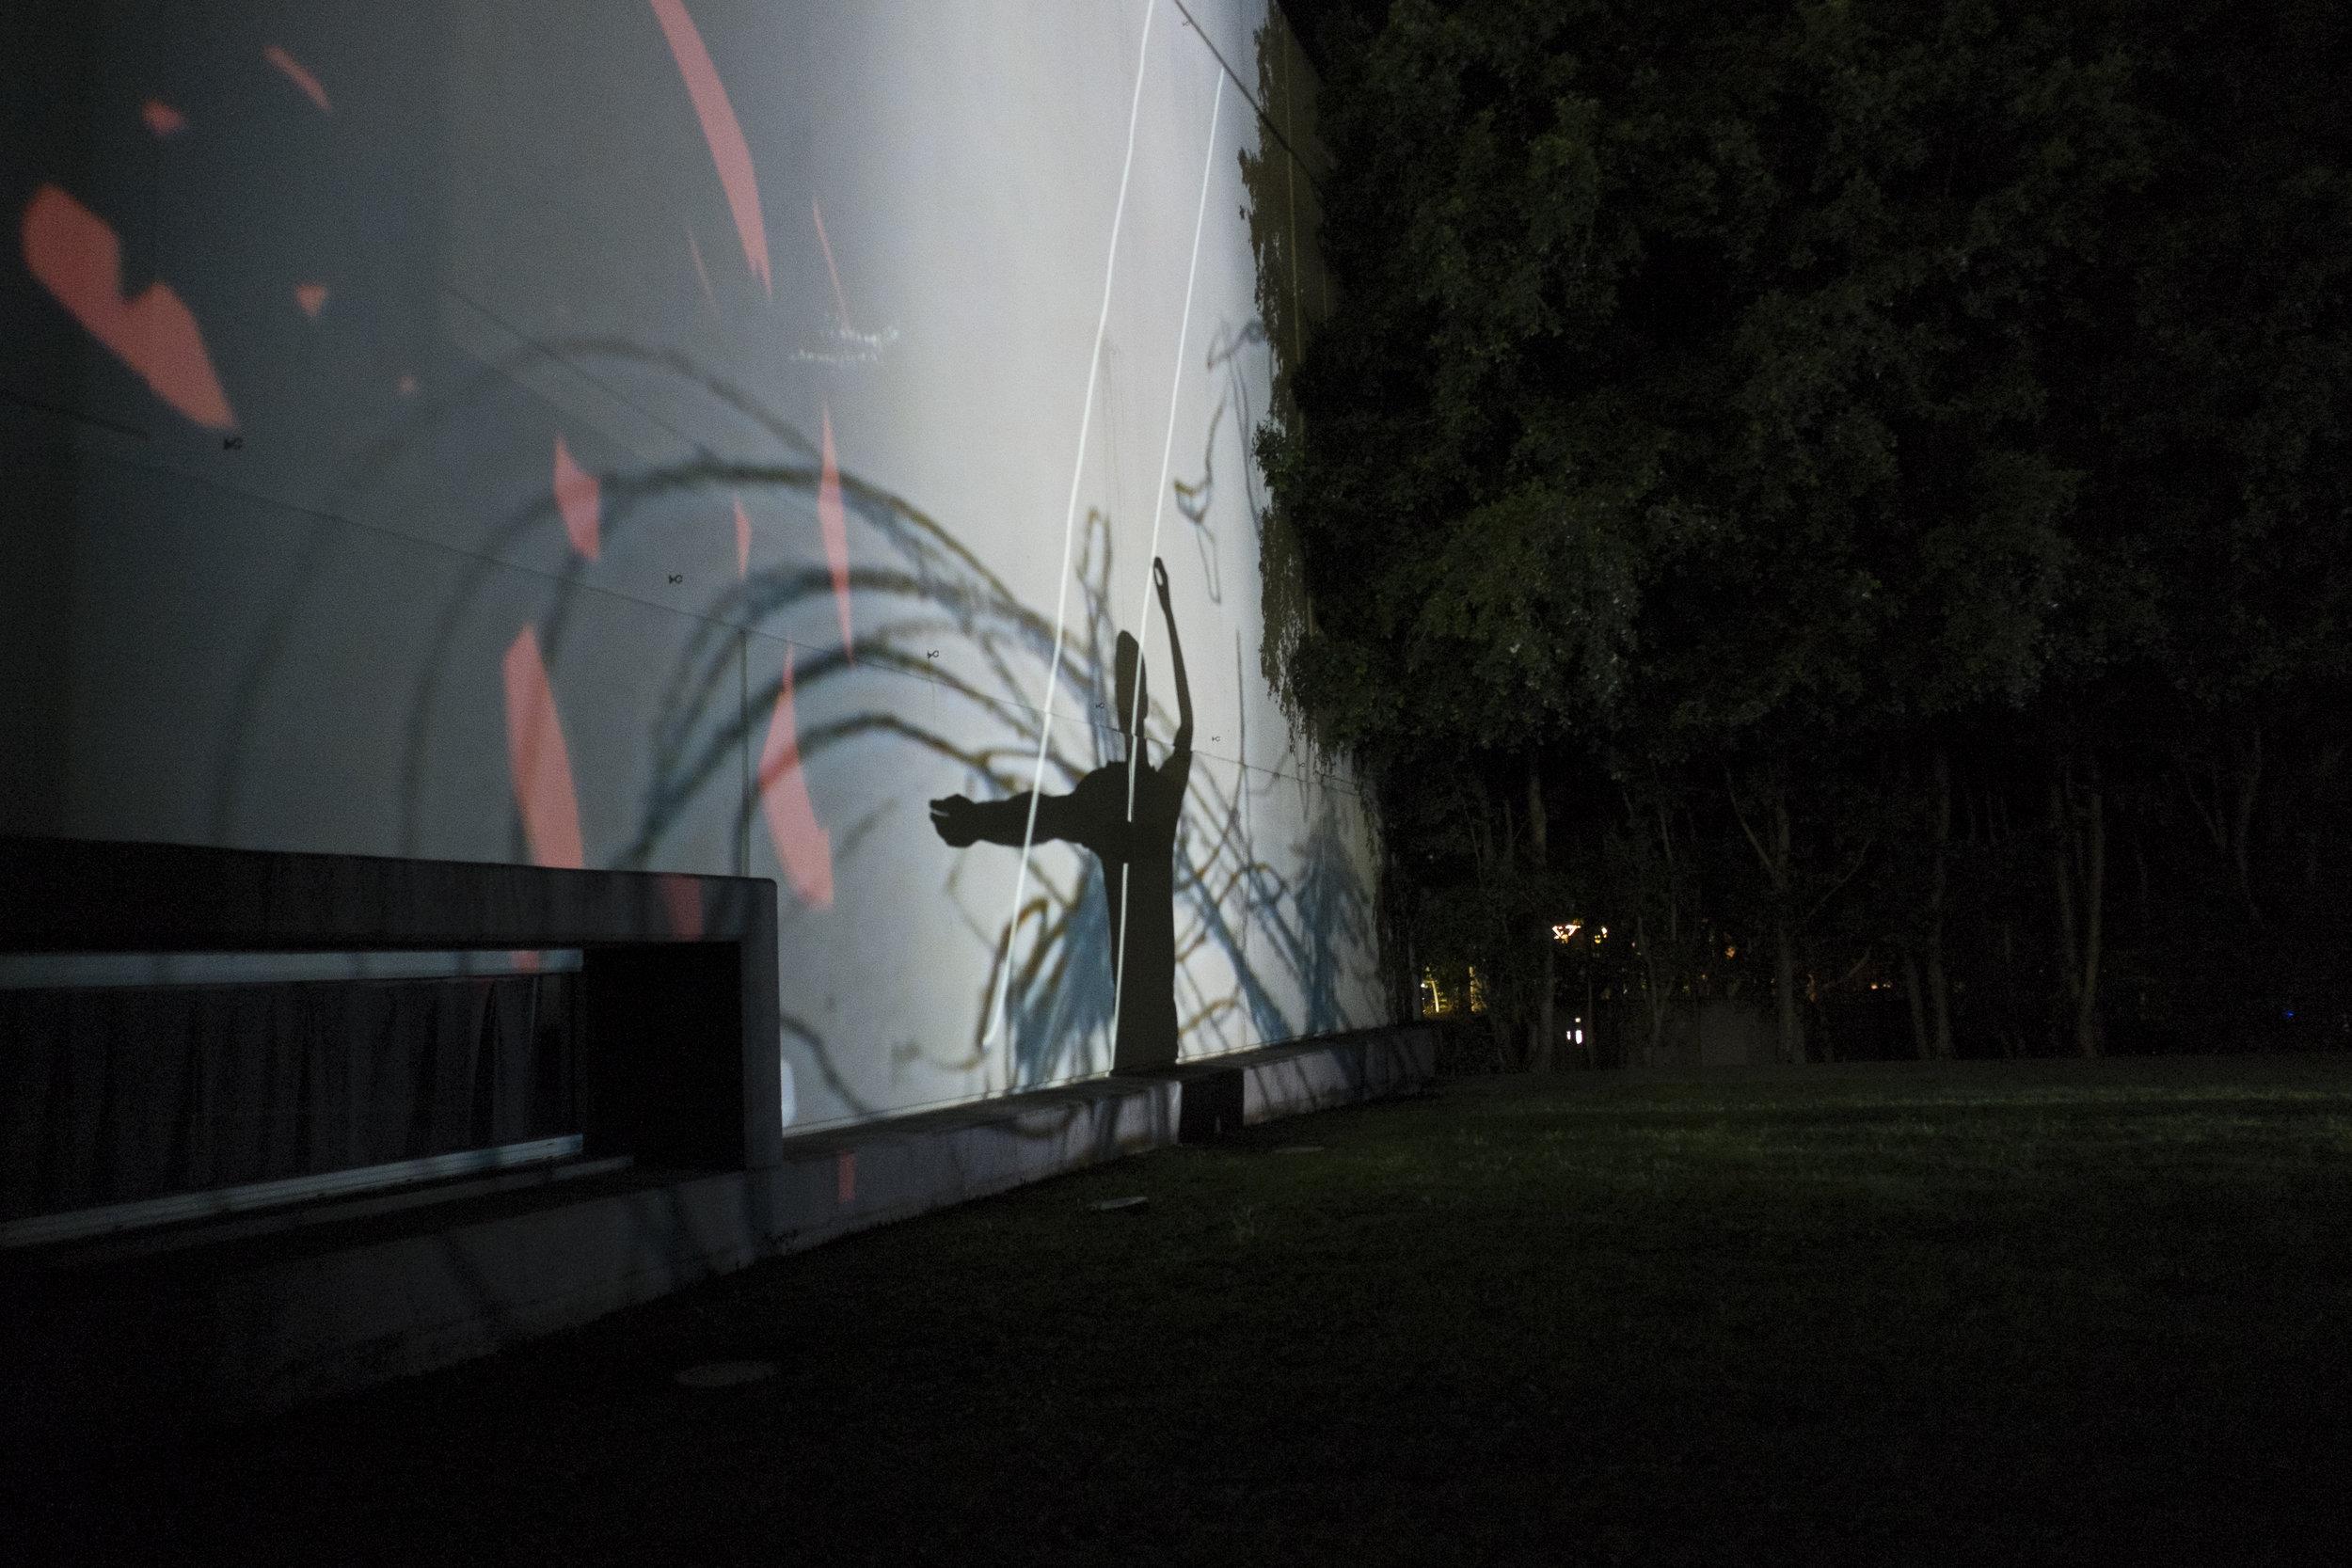 009_Bomb The Wall_Photo Credit Lisa Kurtz-1.jpg